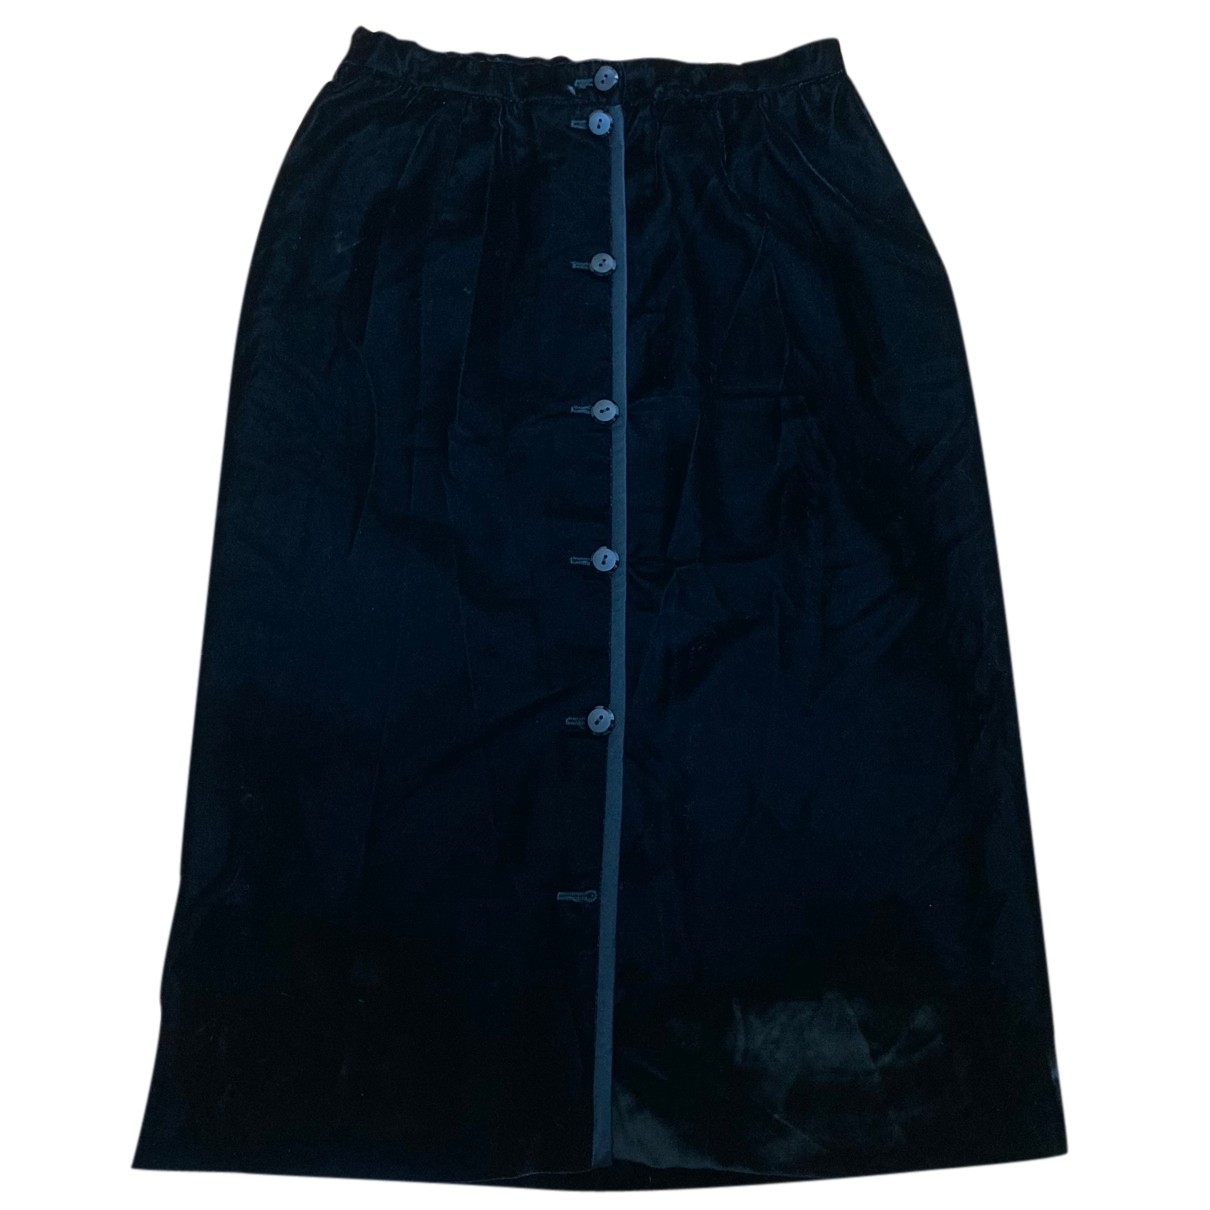 Valentino Garavani - Jupe   pour femme en velours - noir